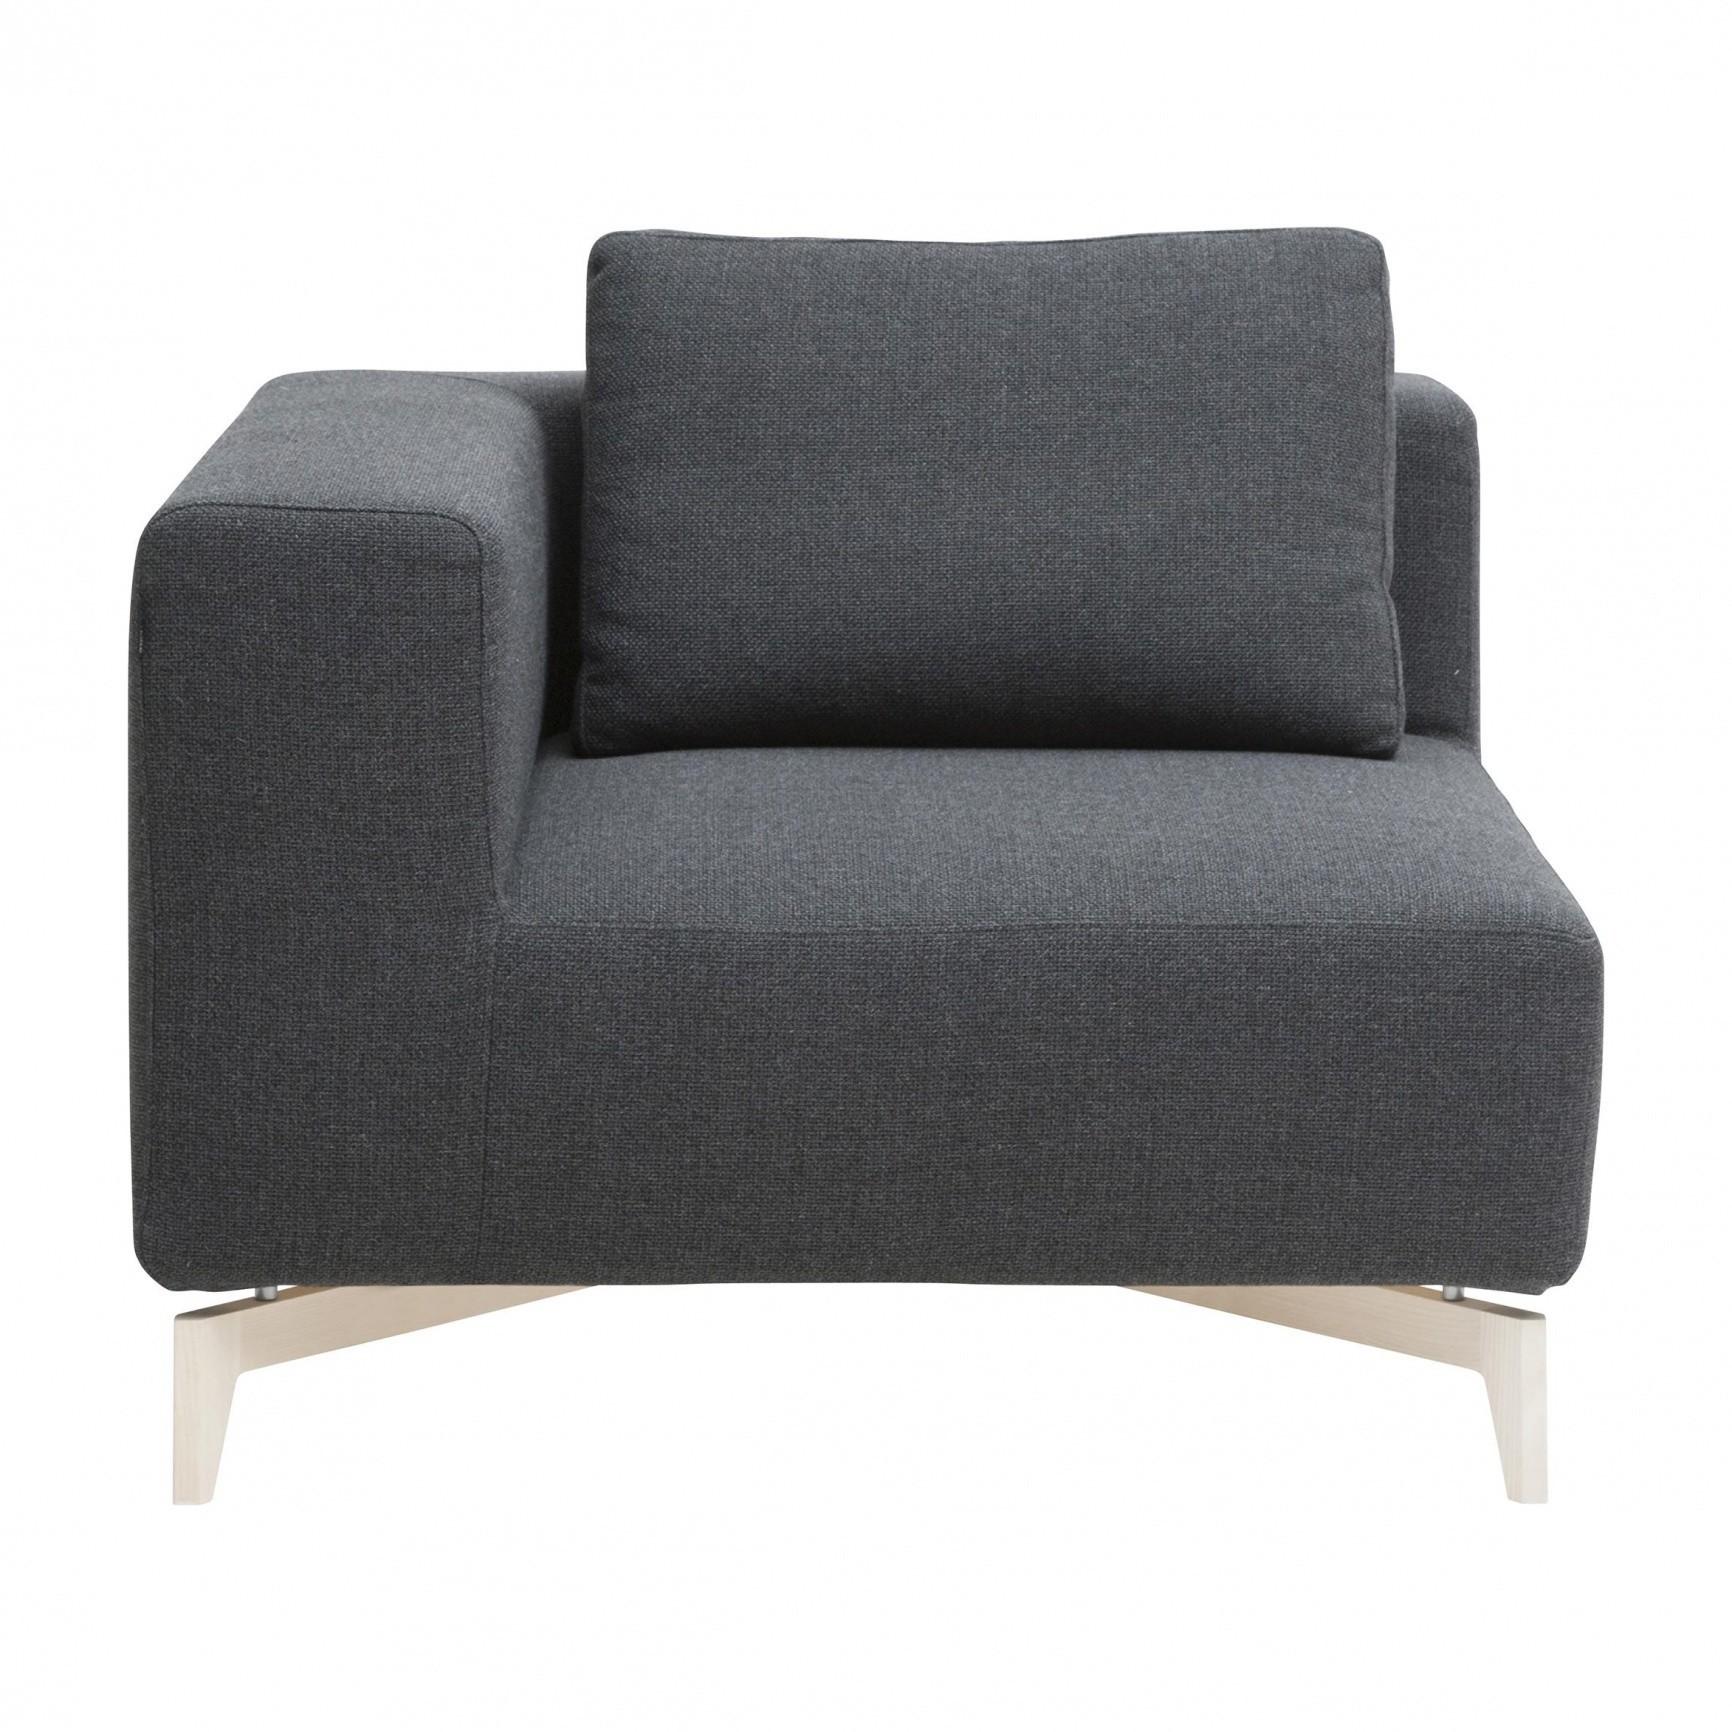 Bare ut Softline Passion Sofa Corner Elements | AmbienteDirect WQ-36